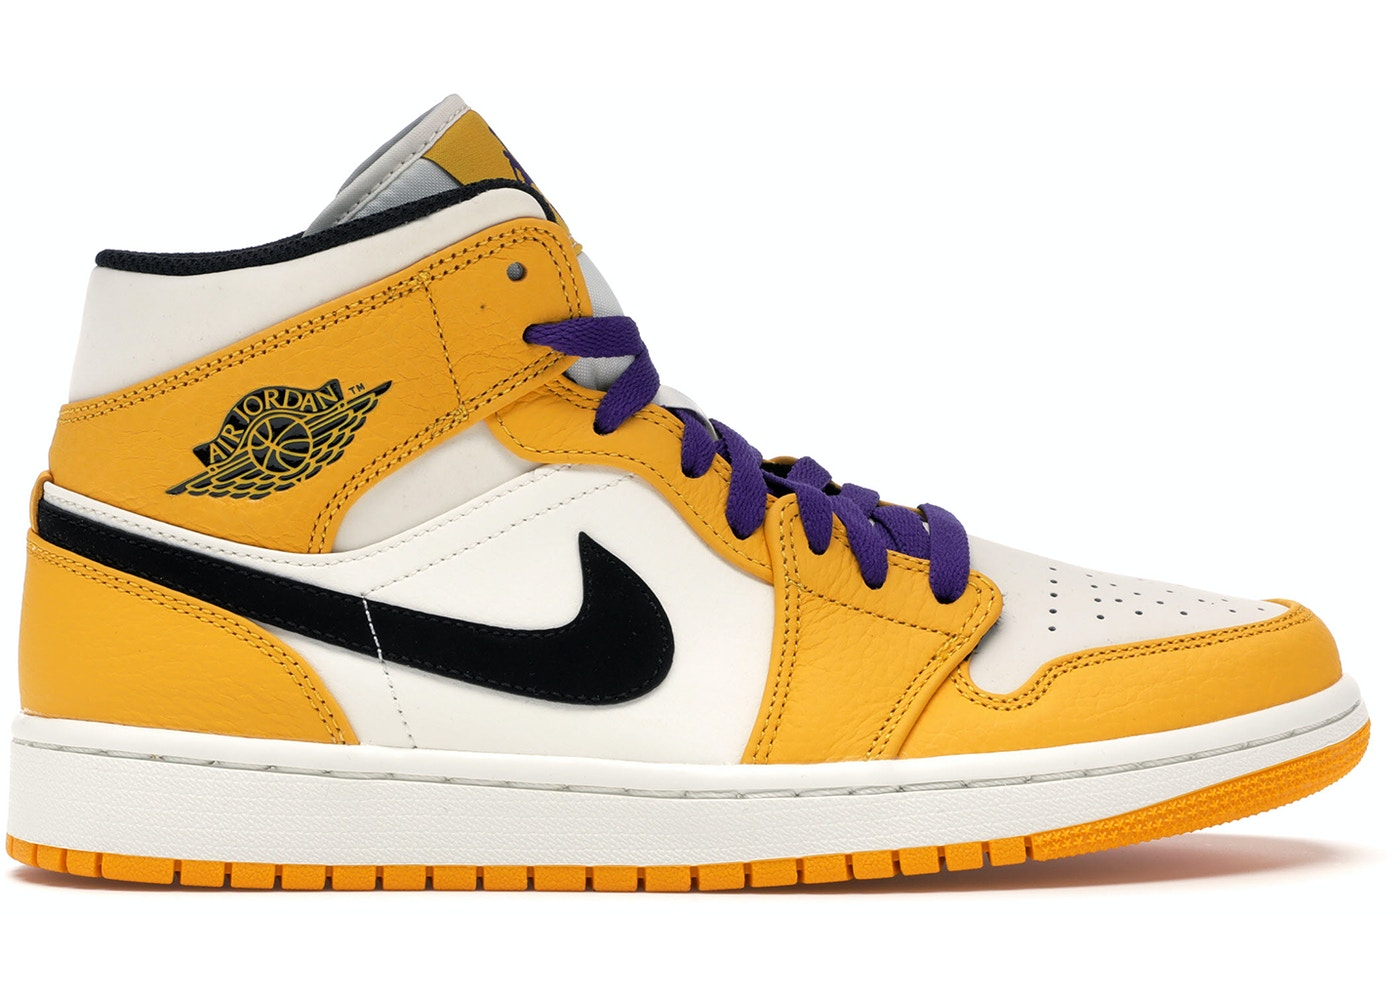 4189ea2f970 Buy Air Jordan Shoes   Deadstock Sneakers